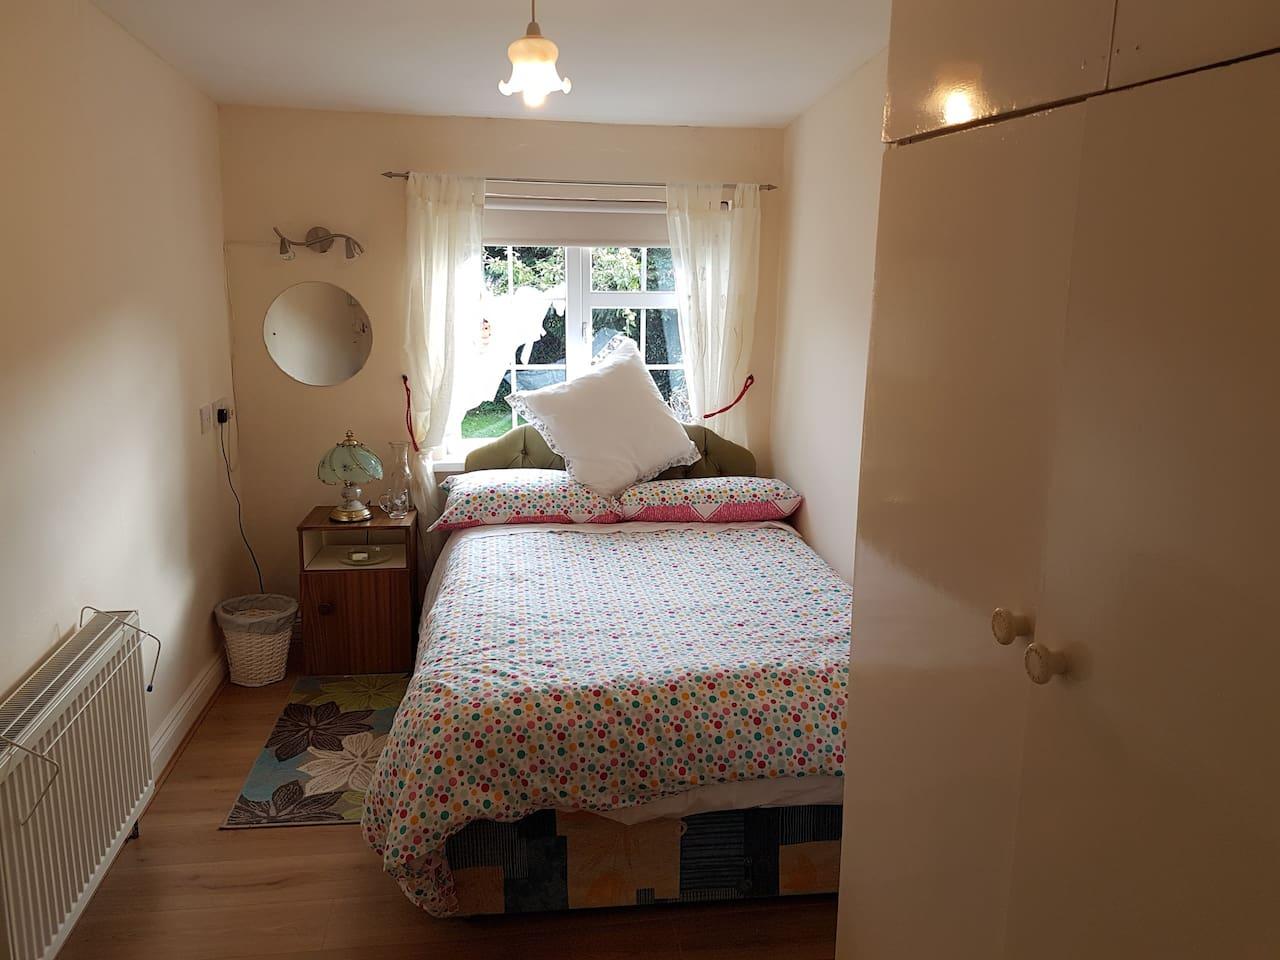 The bedroom - you will not believe how quiet it is in here!